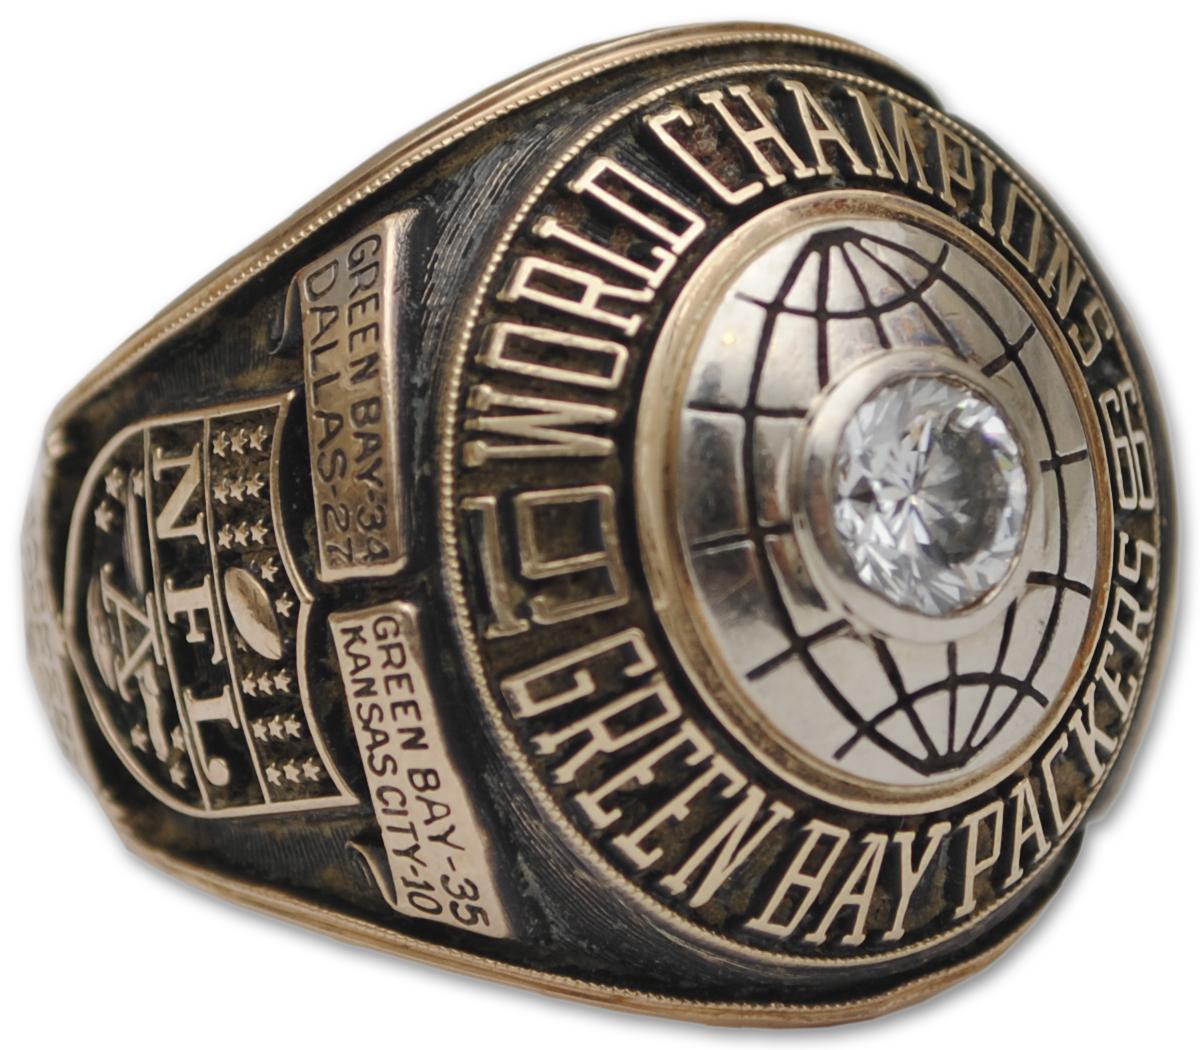 Super Bowl I ring (click to enlarge)